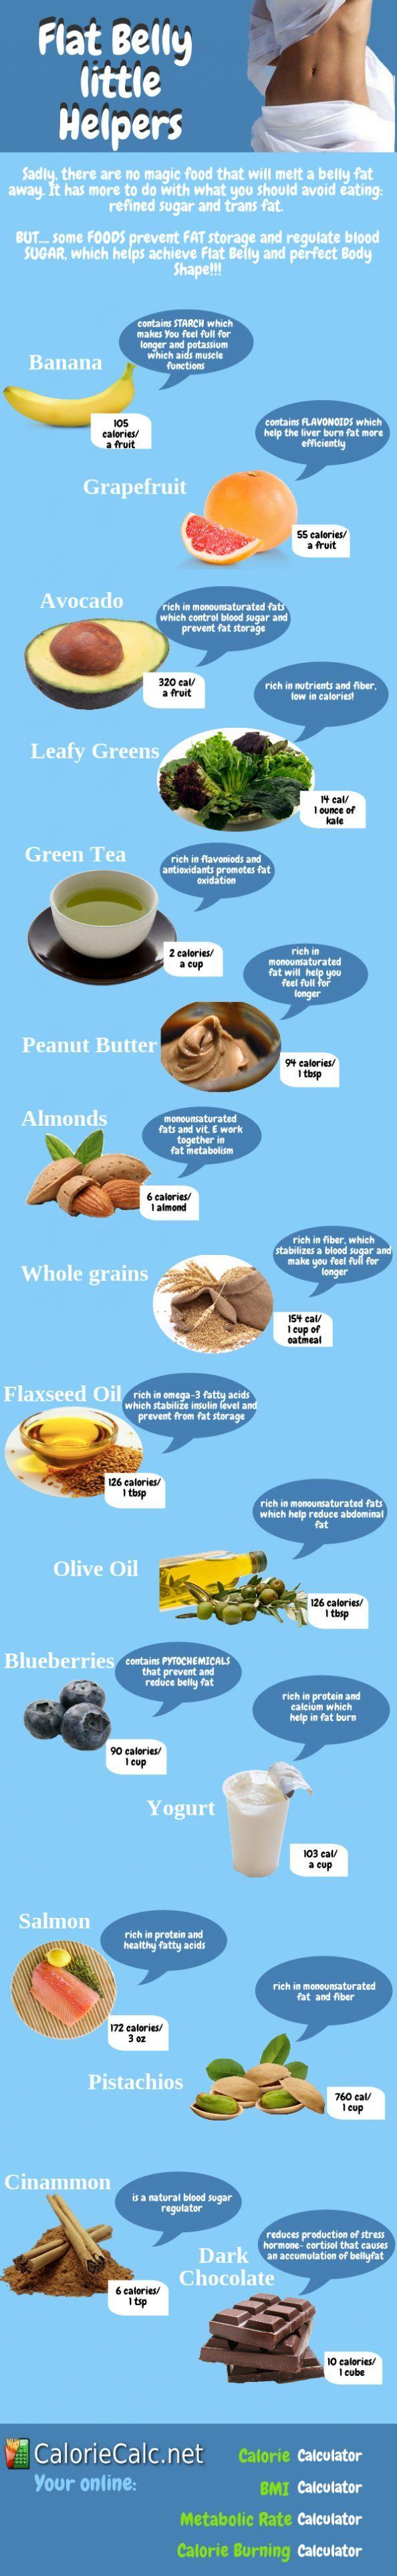 15 pound weight loss workout plan image 4